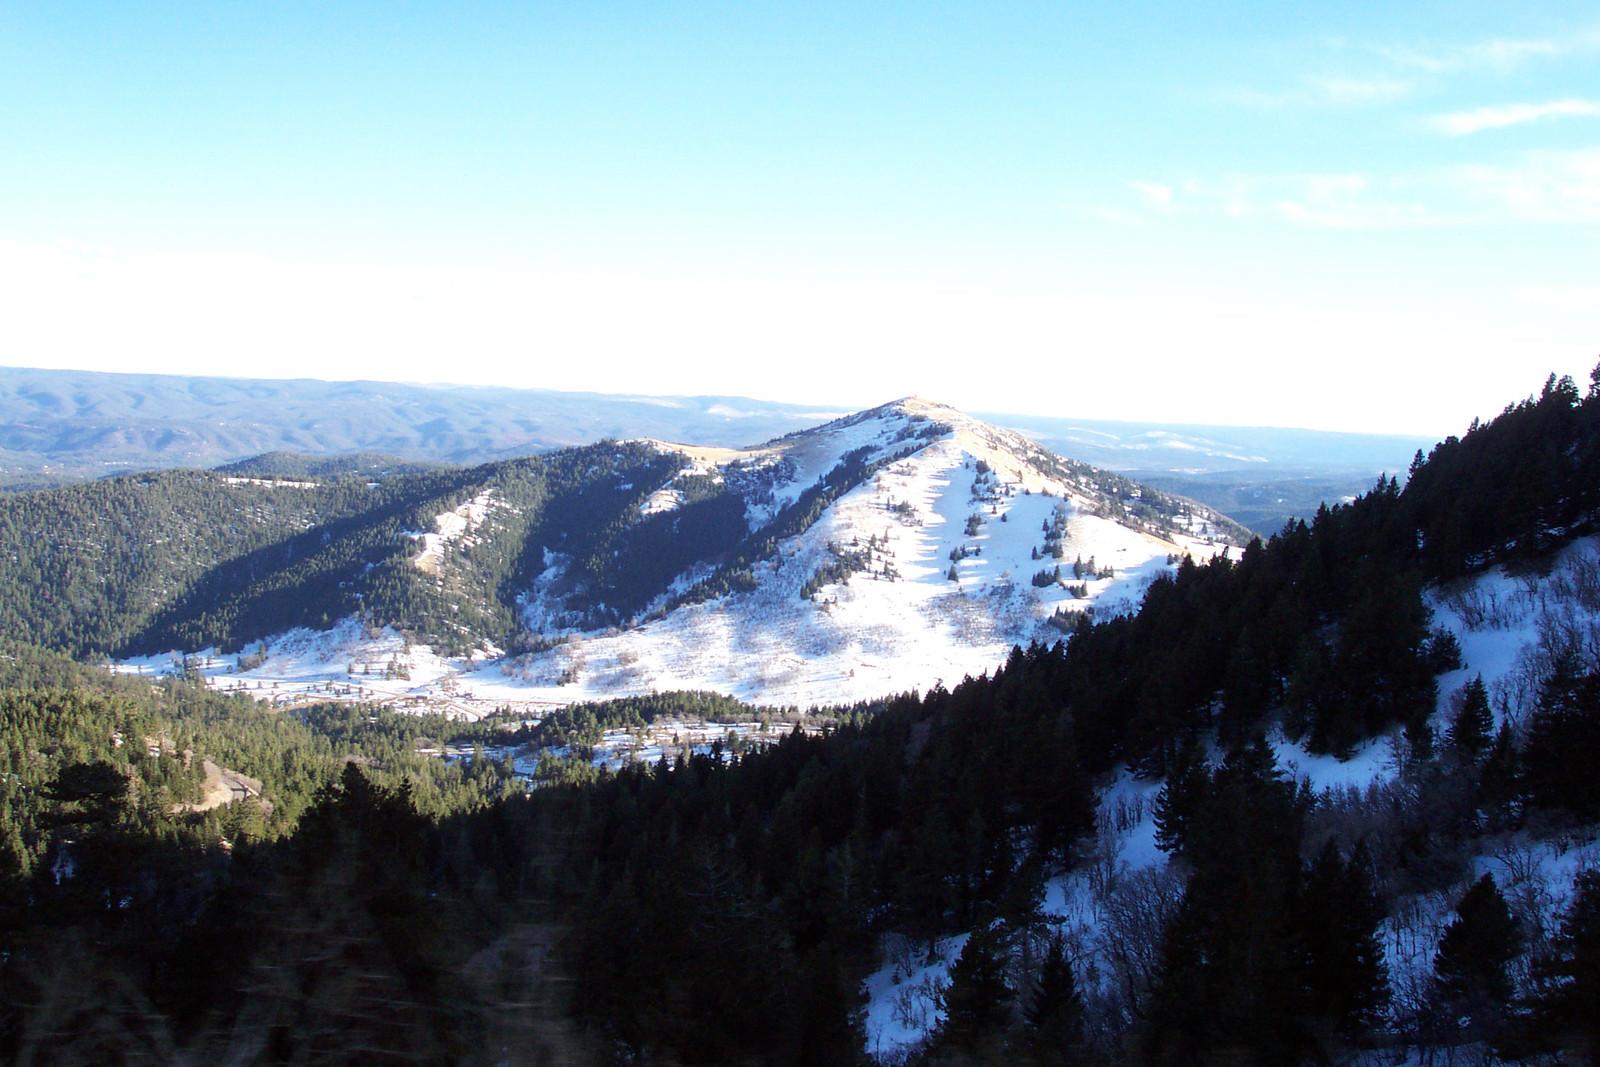 Sierra Blanca Mountains surrounding Ruidoso